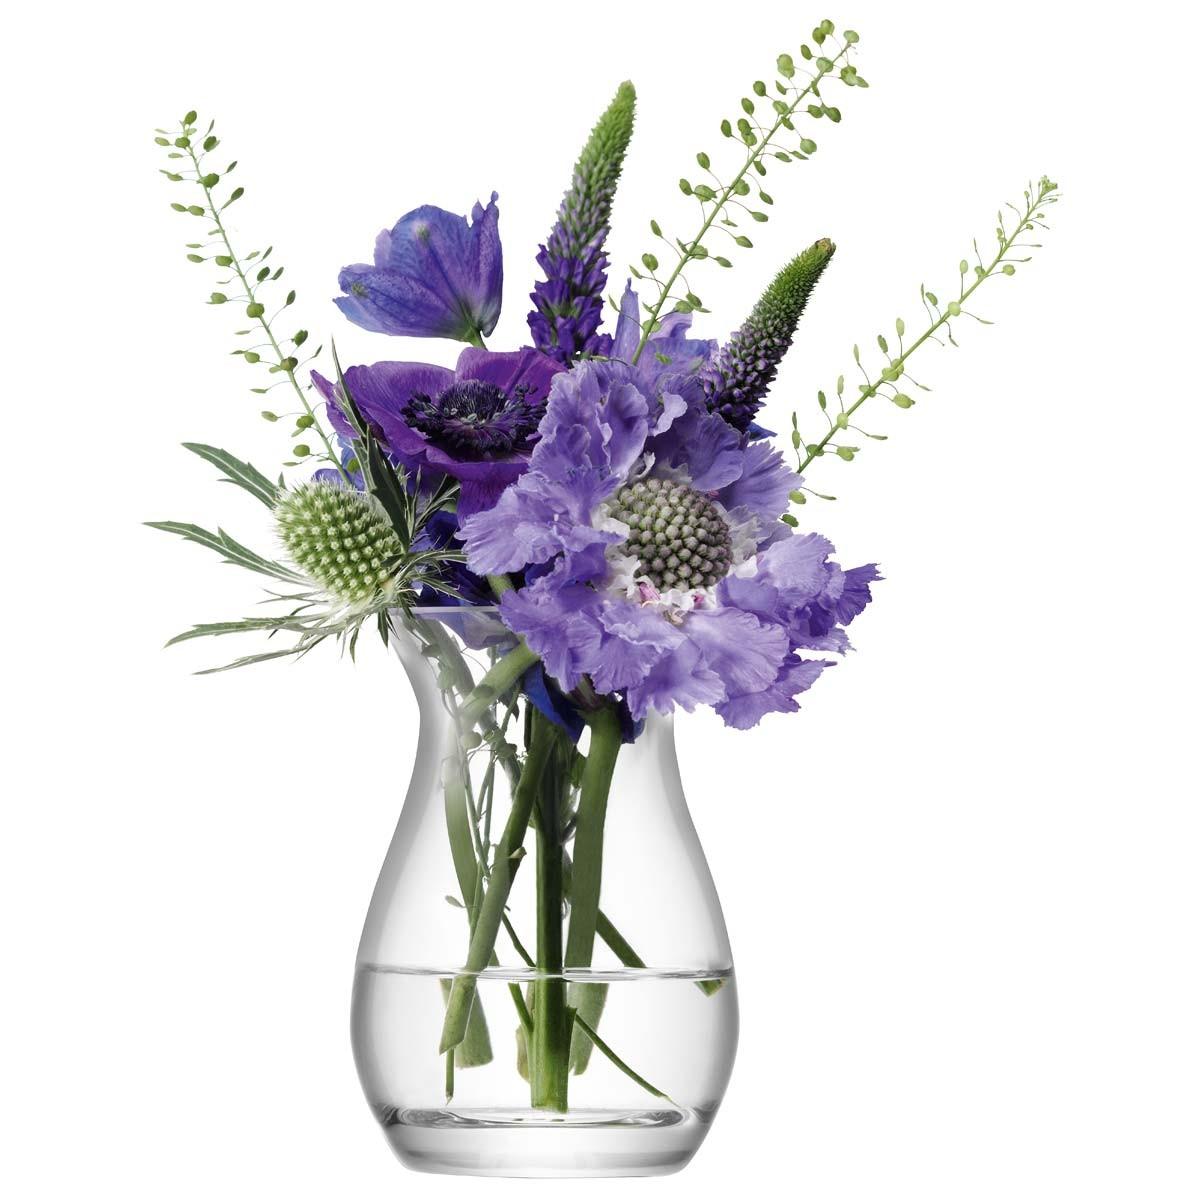 4722-lr_01_flower-mini-posy-vase